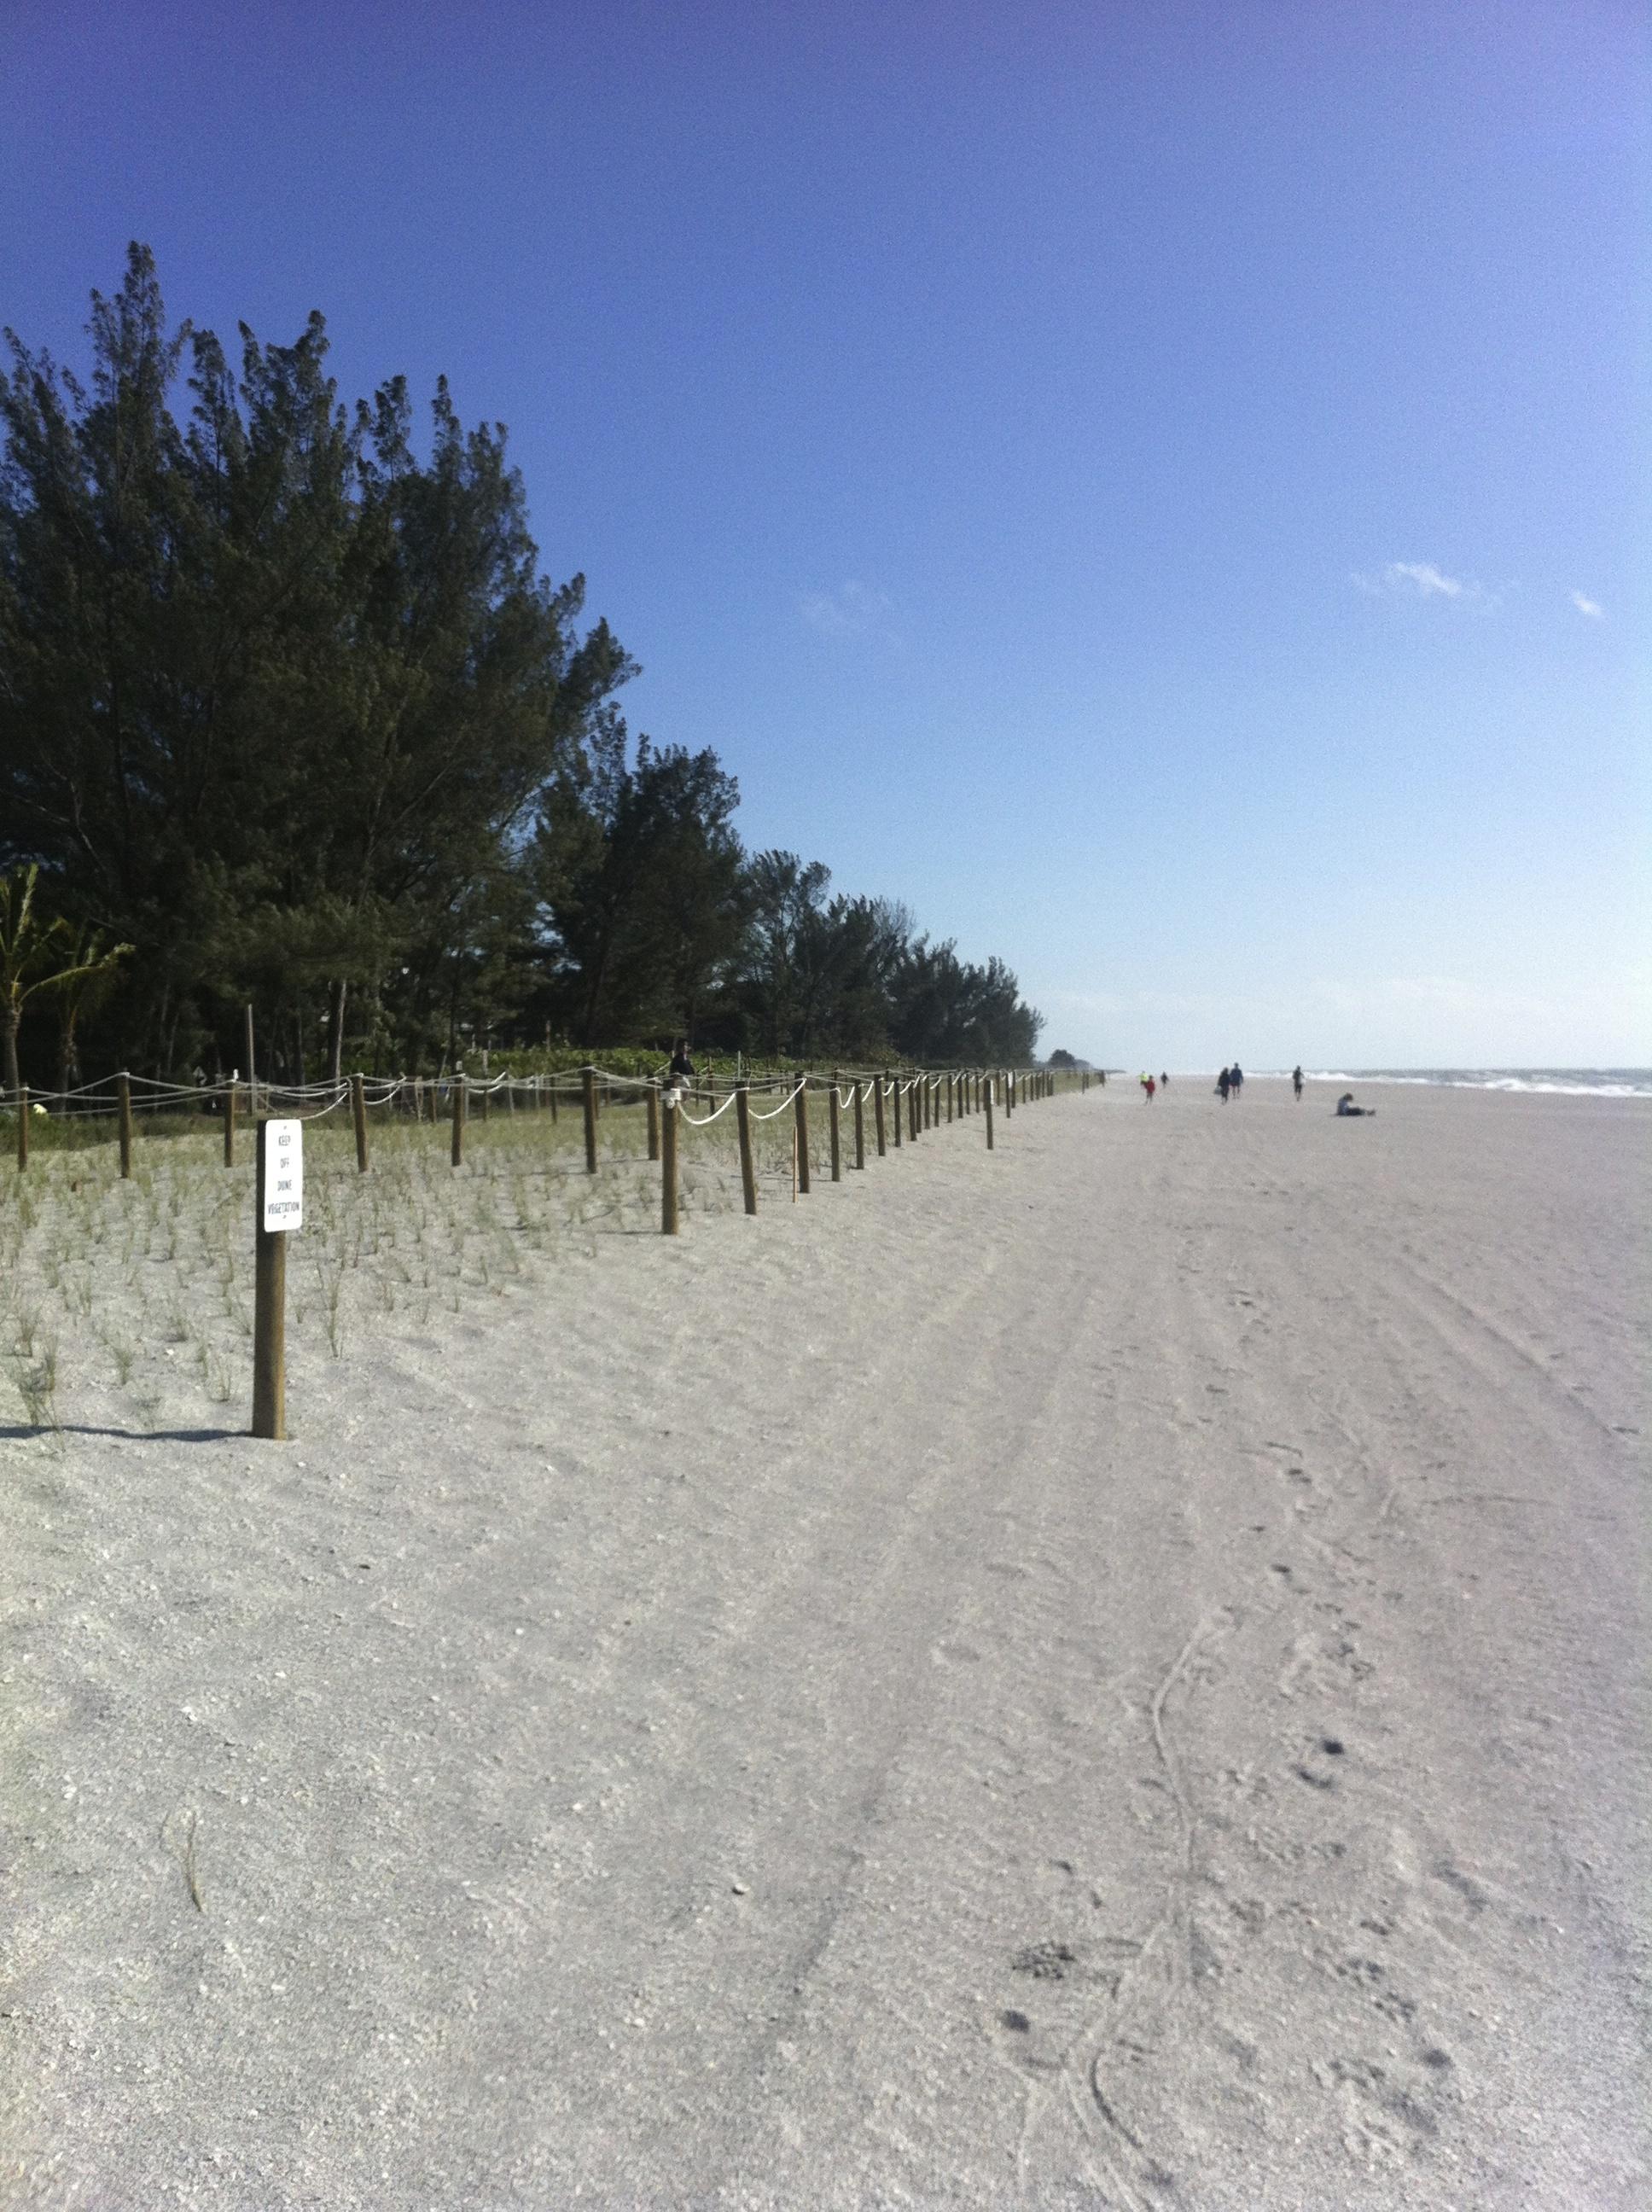 Wildlife Refuge On Sanibel Island, Florida